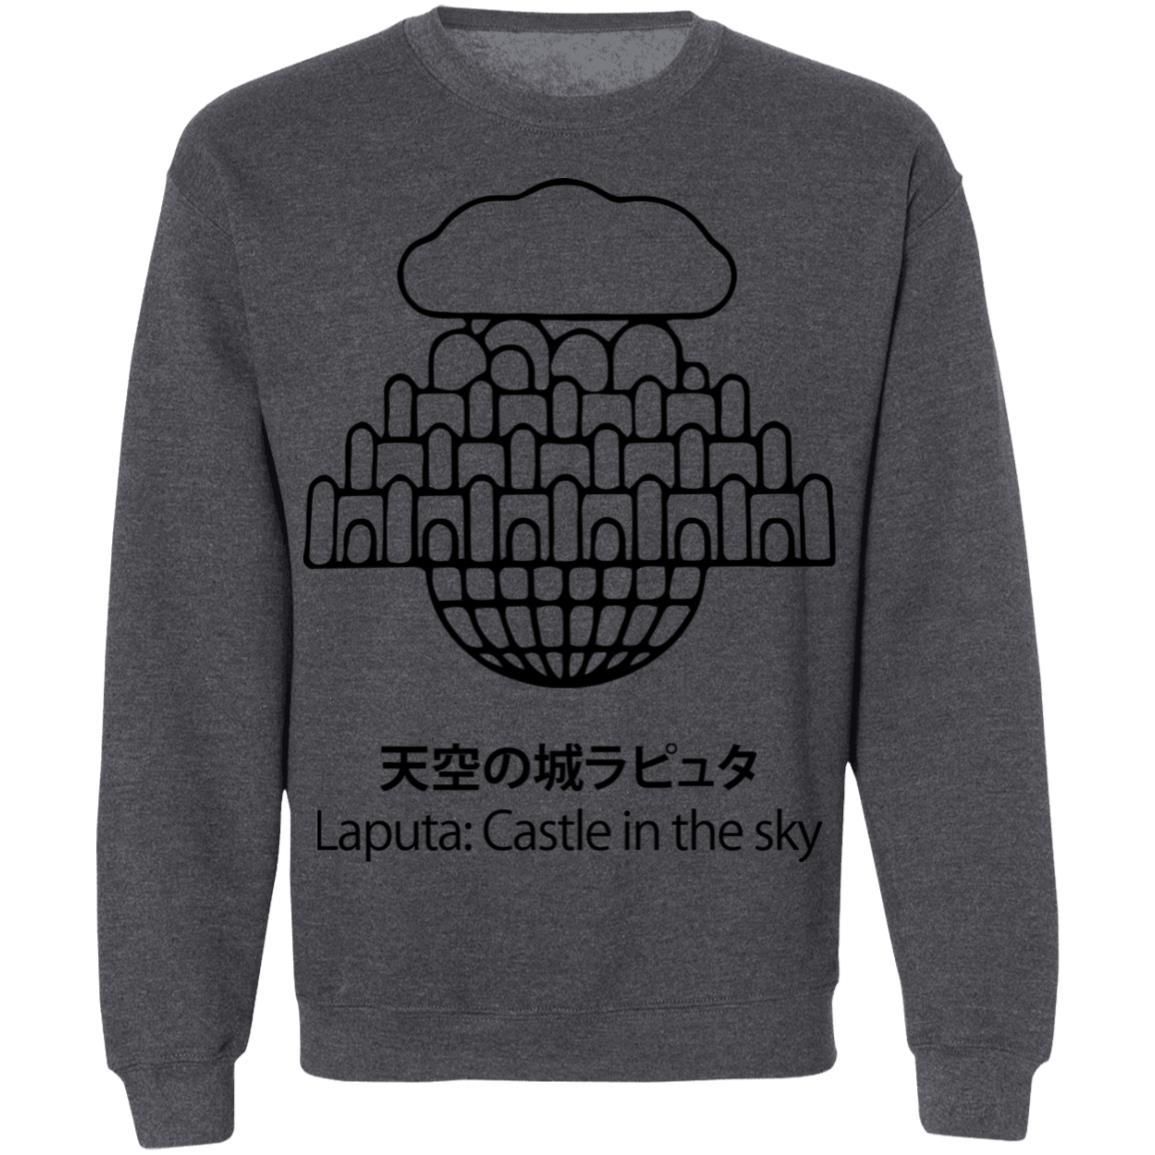 Laputa: Castle In The Sky Sweatshirt Unisex